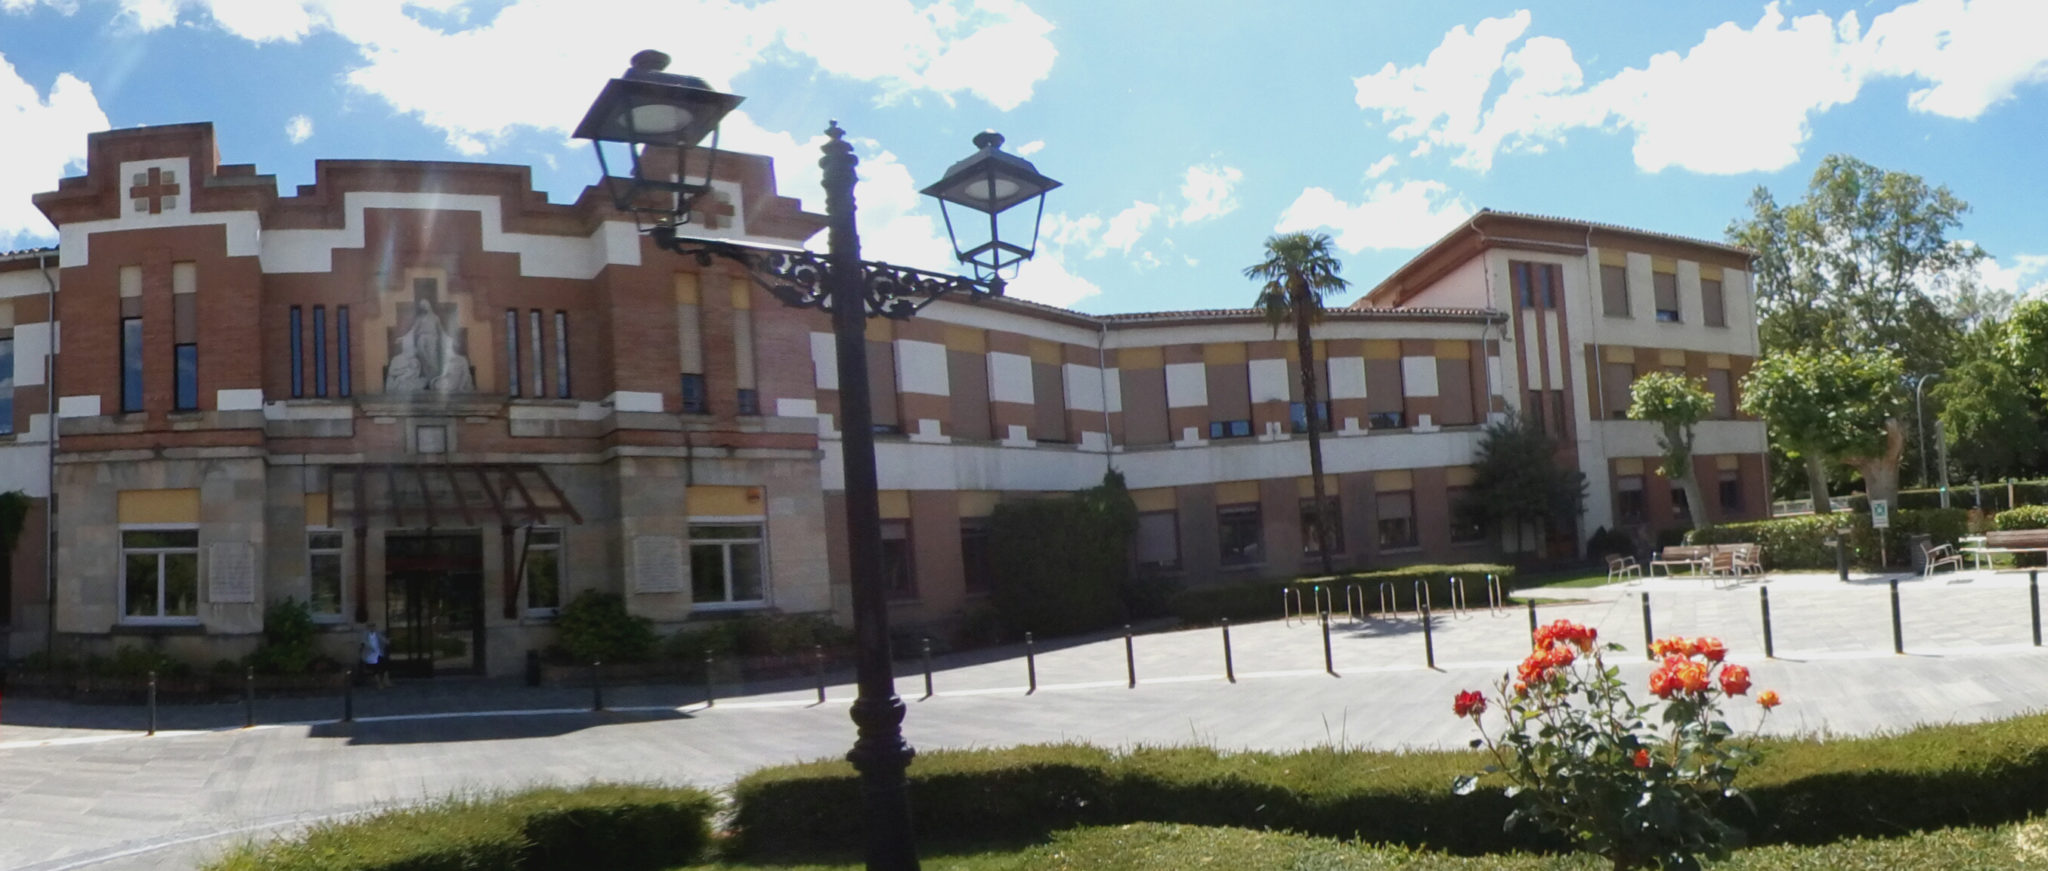 Fachada Casa de Misericordia